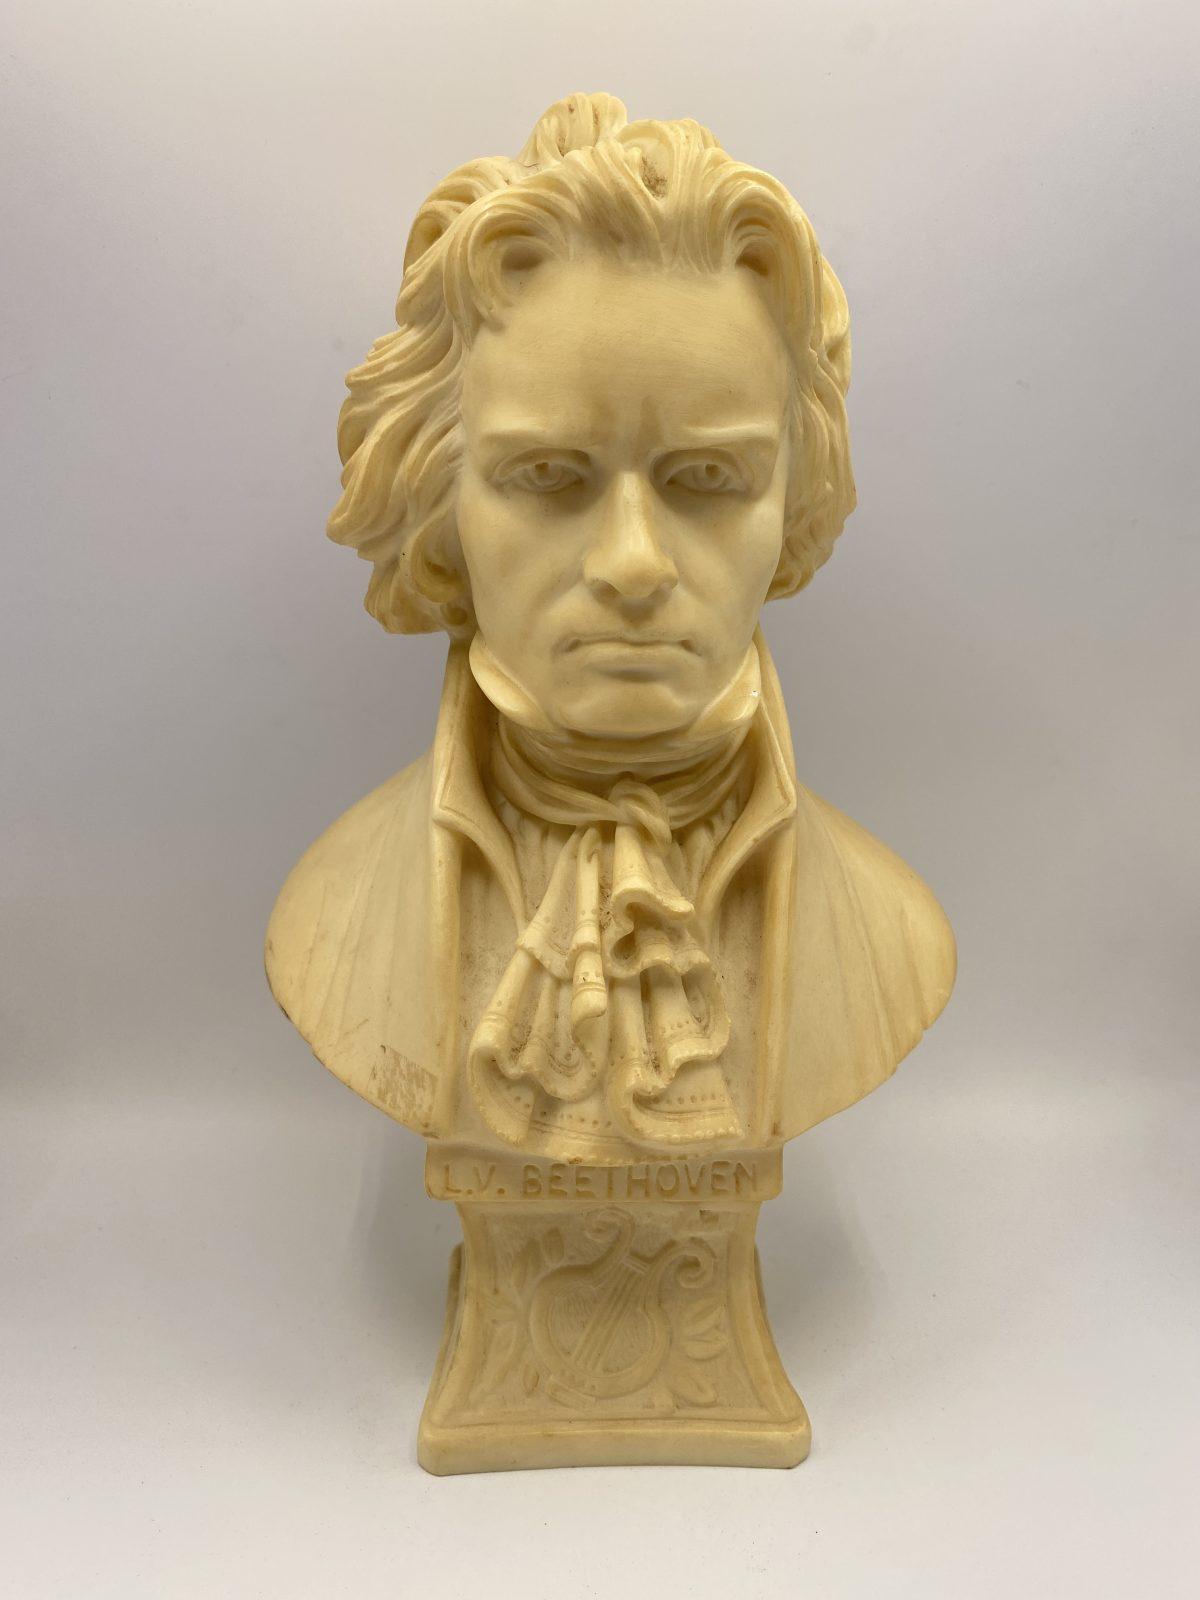 G9 - A Vintage French Alabaster Bust of Beethoven.   £42